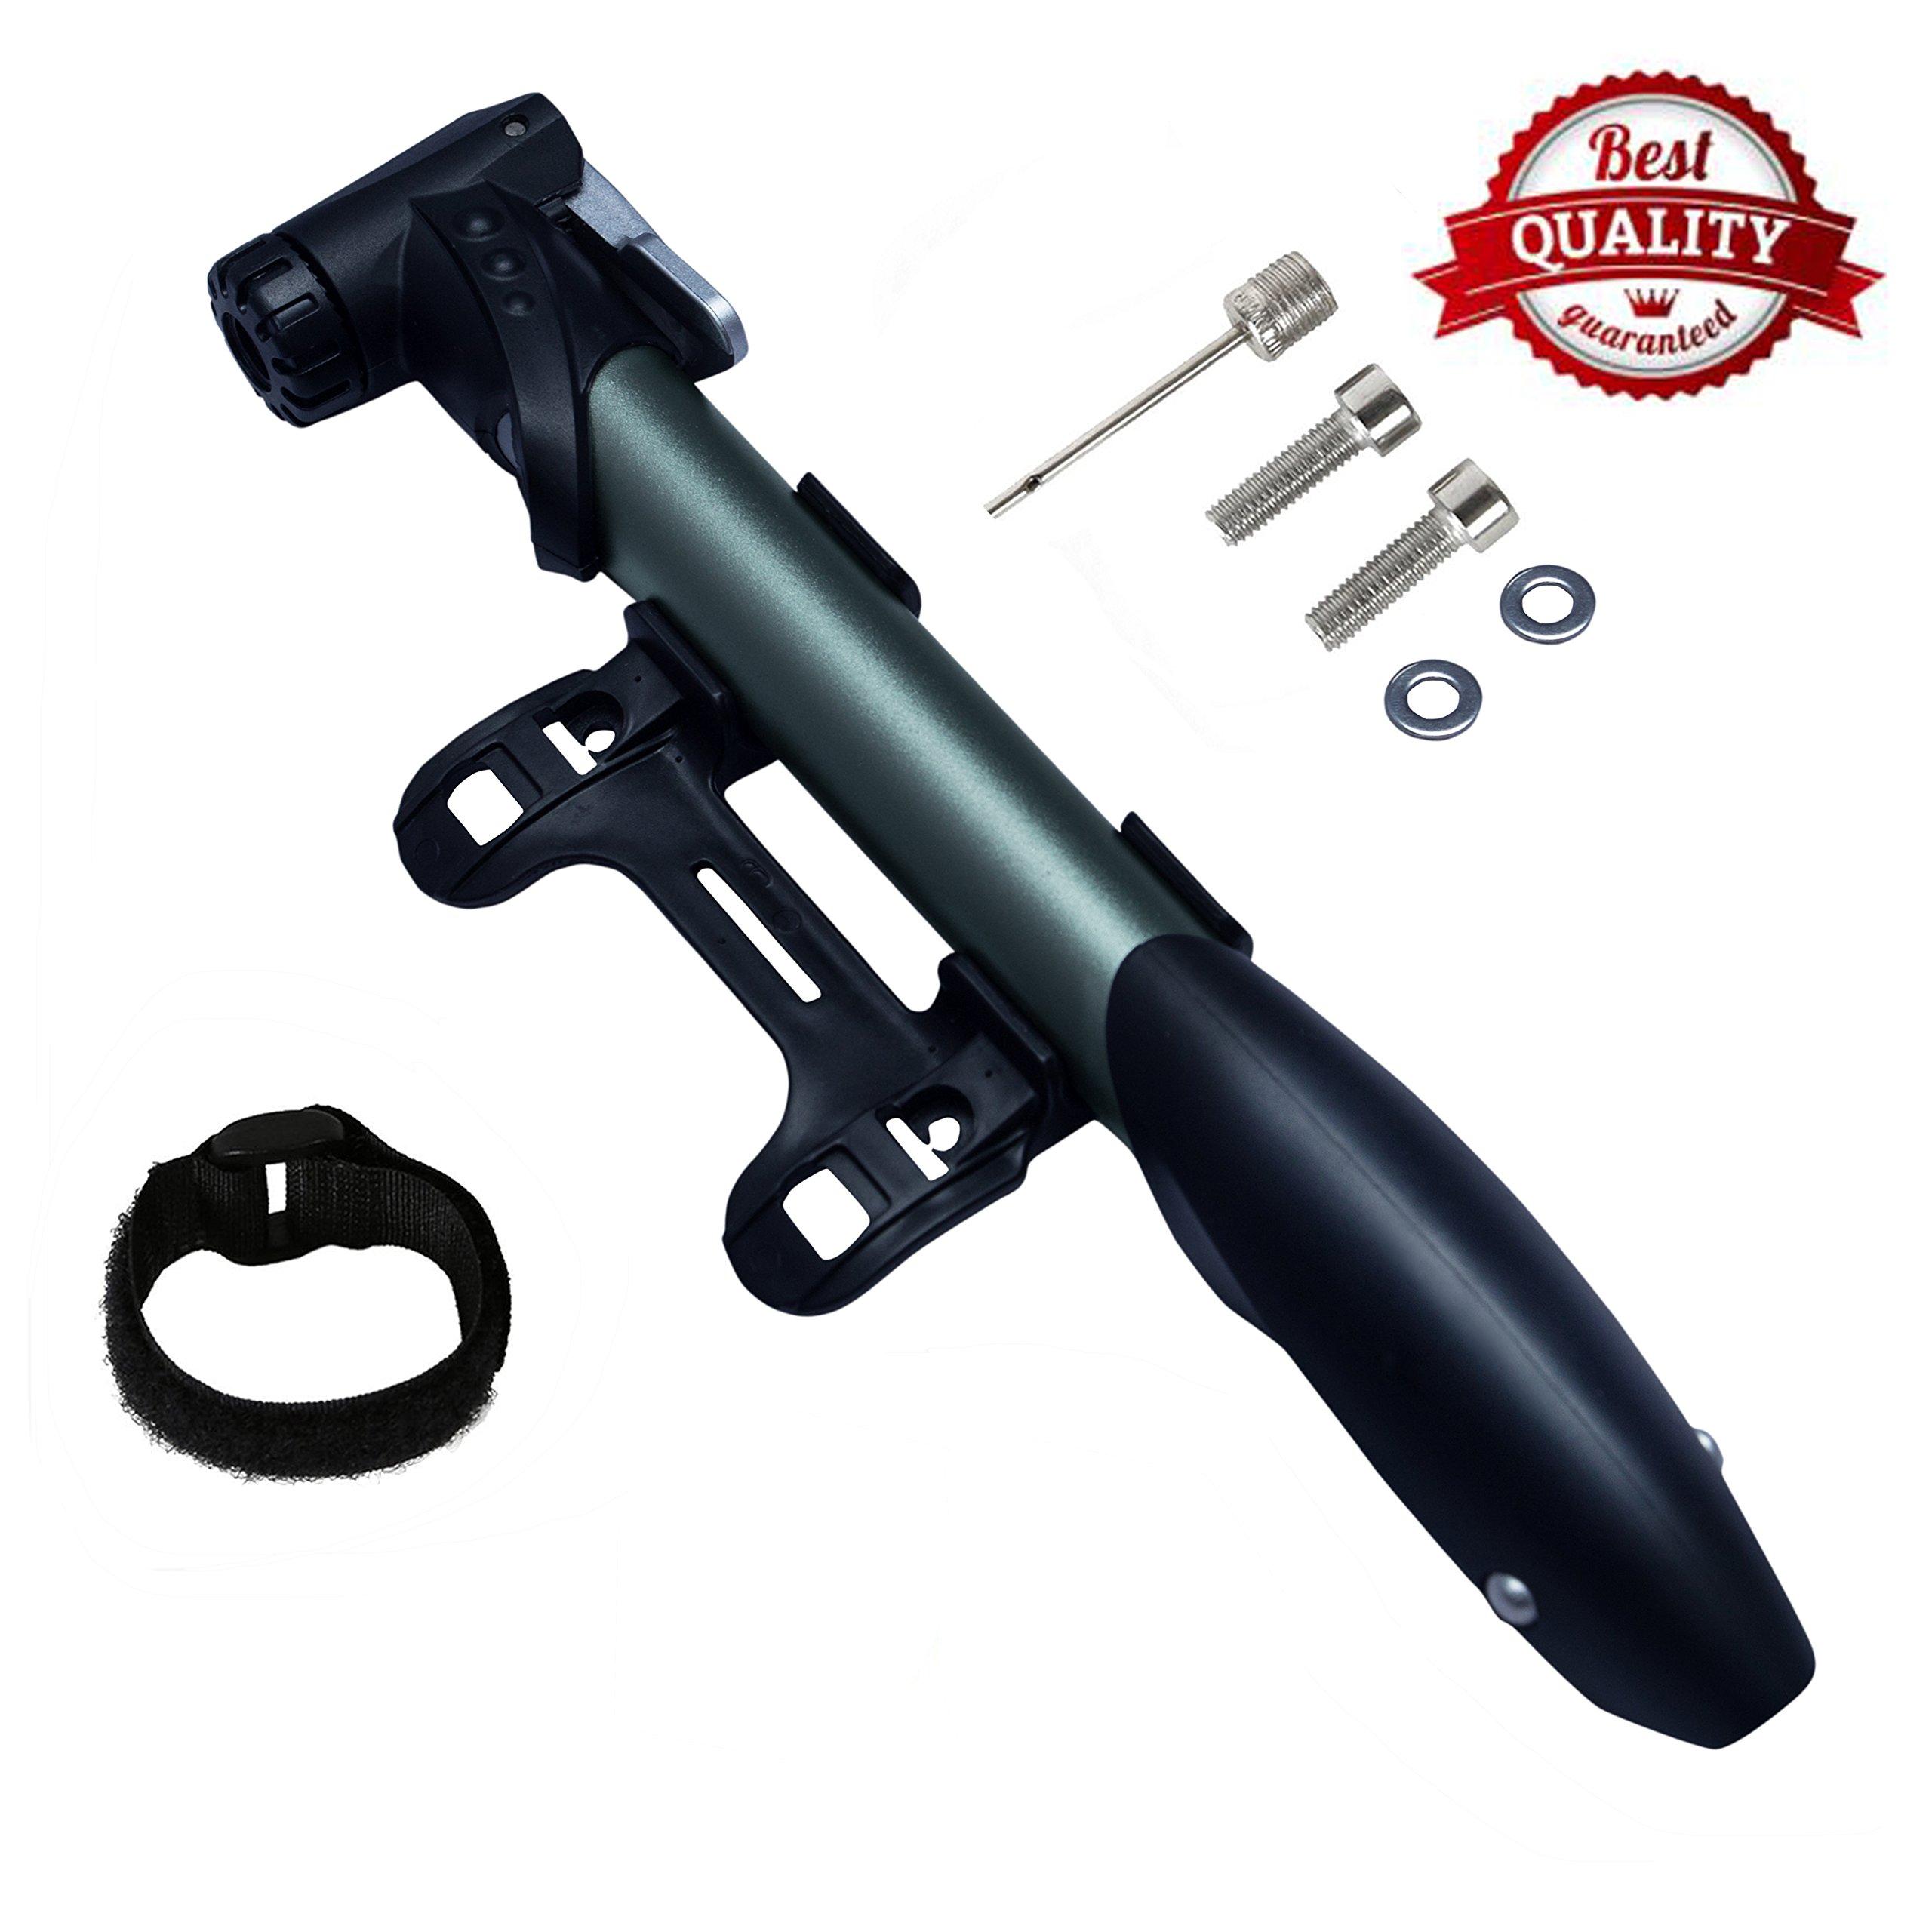 Premium Mini Bike Pump,Mountain Bike Pump,Bike Tire Pump,Bike Pump Kids,High Pressure 120 PSI, Bicycle Pump Portable, Presta & Schrader Bike Valve Adapter,Sports Needle Included